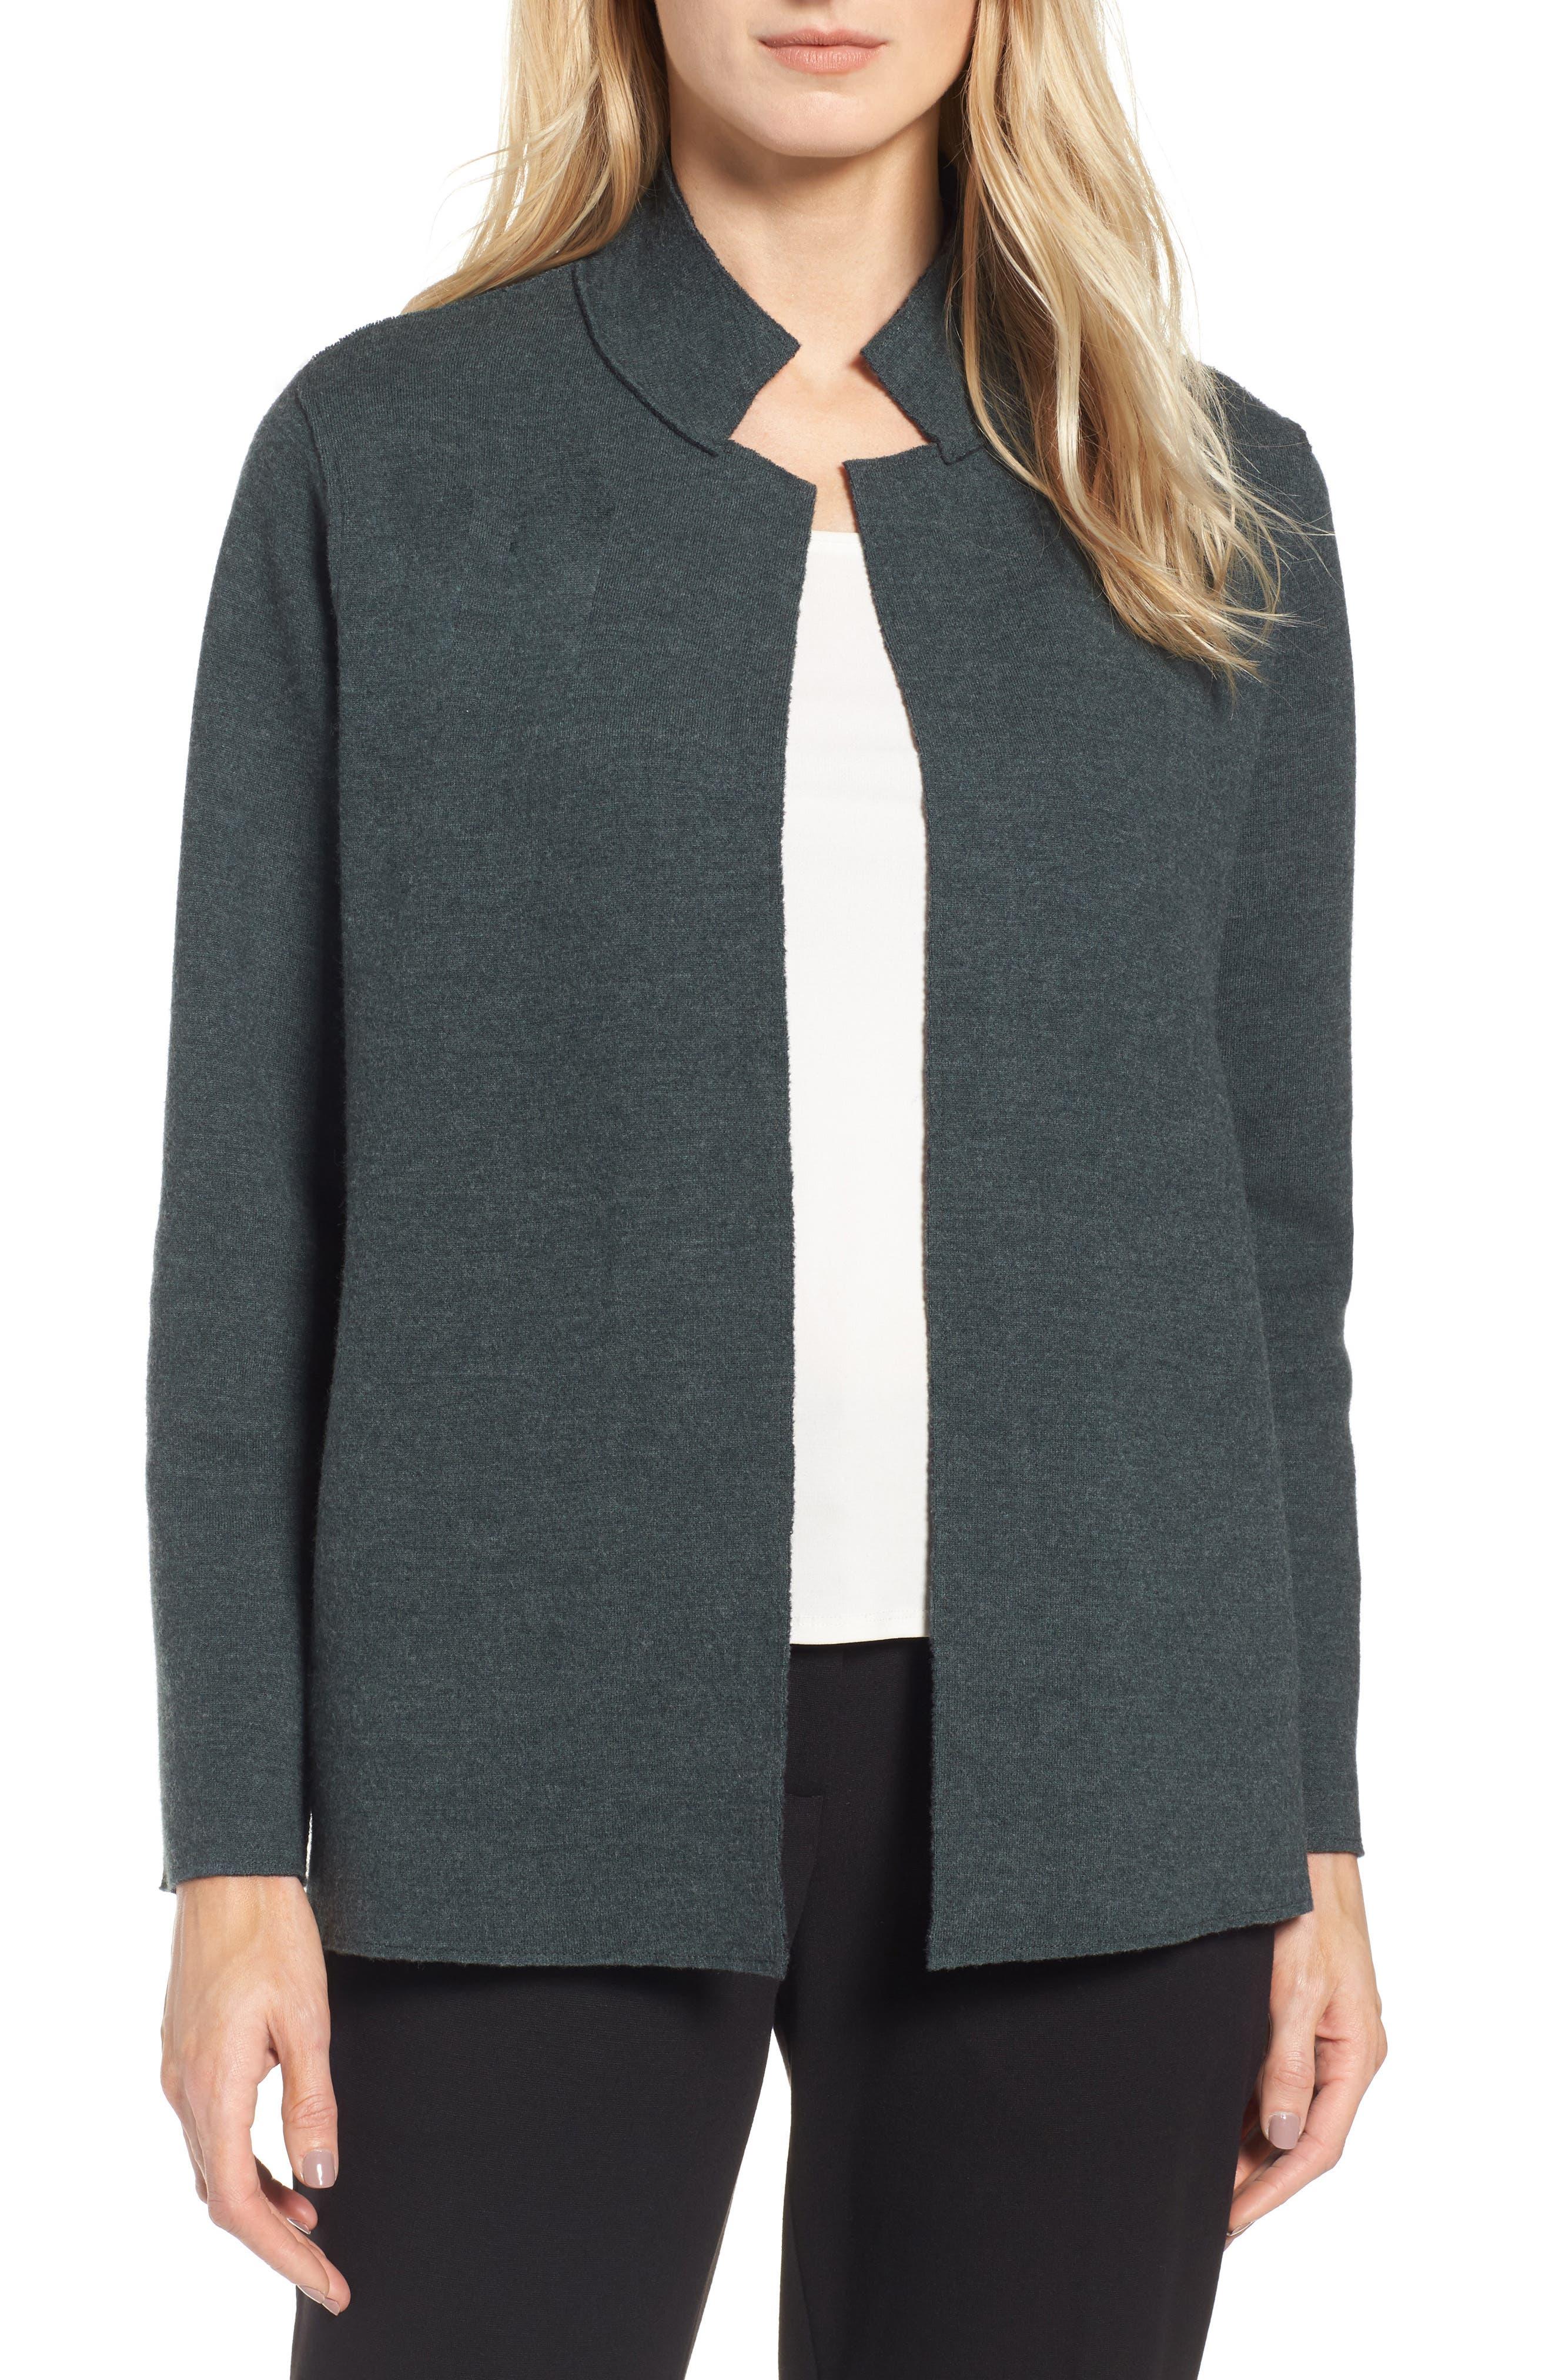 Eileen Fisher Merino Wool Blend Jacket (Regular & Petite)